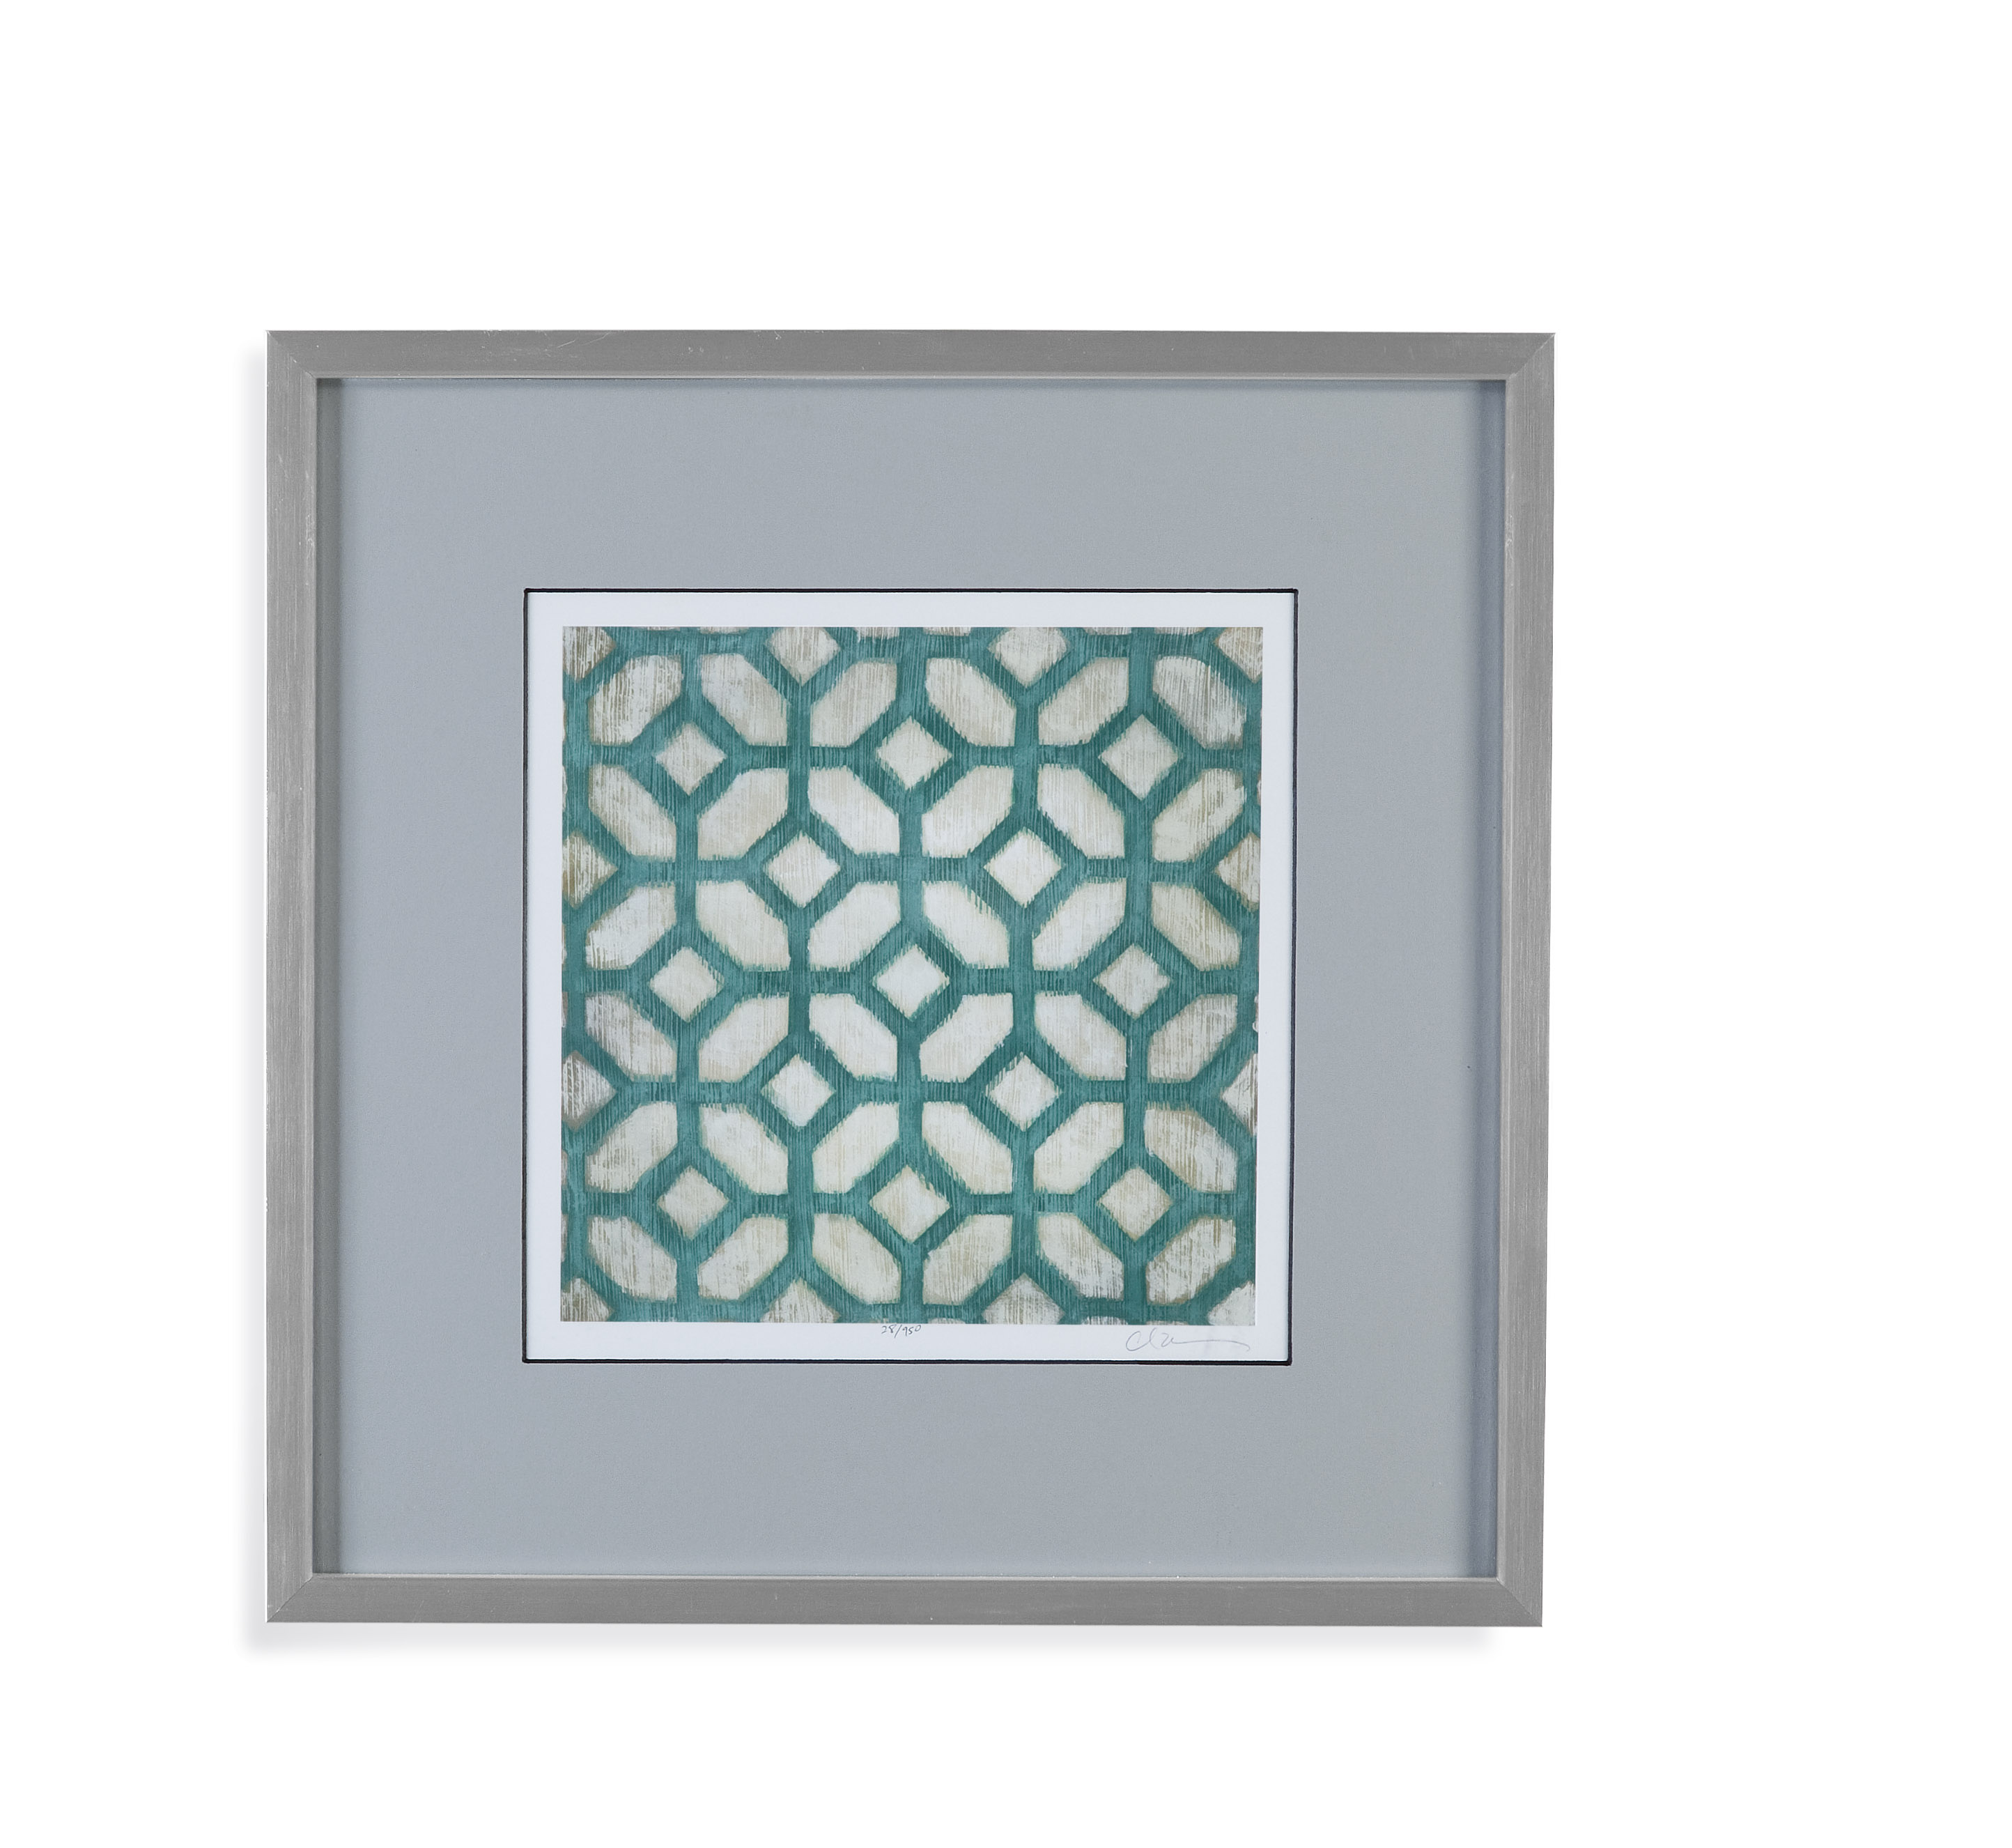 Thoroughly Modern Spectrum Symmetry IX by Bassett Mirror at Alison Craig Home Furnishings